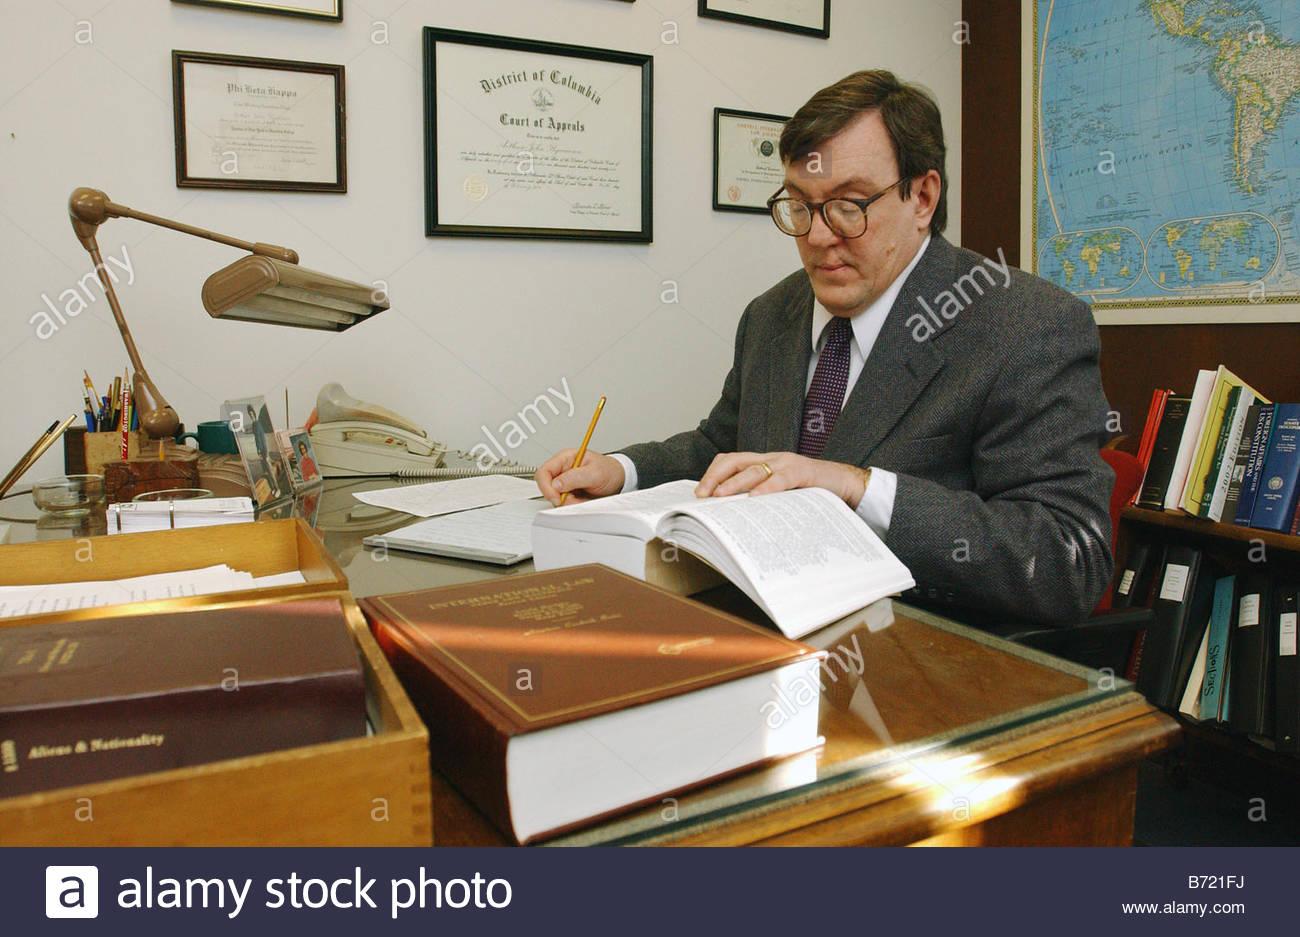 11503 arthur rynearson rynearson j sous conseiller législatif pour